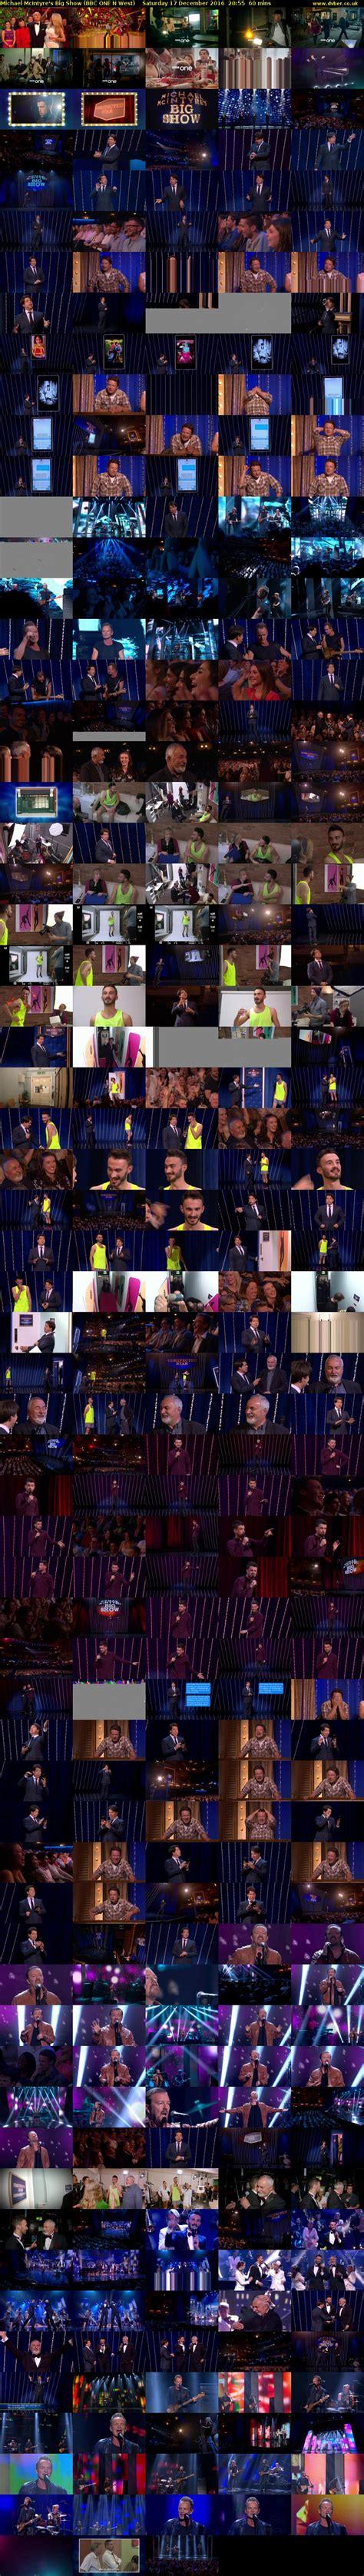 jack whitehall michael mcintyre big show michael mcintyre s big show bbc one 2016 12 17 2055